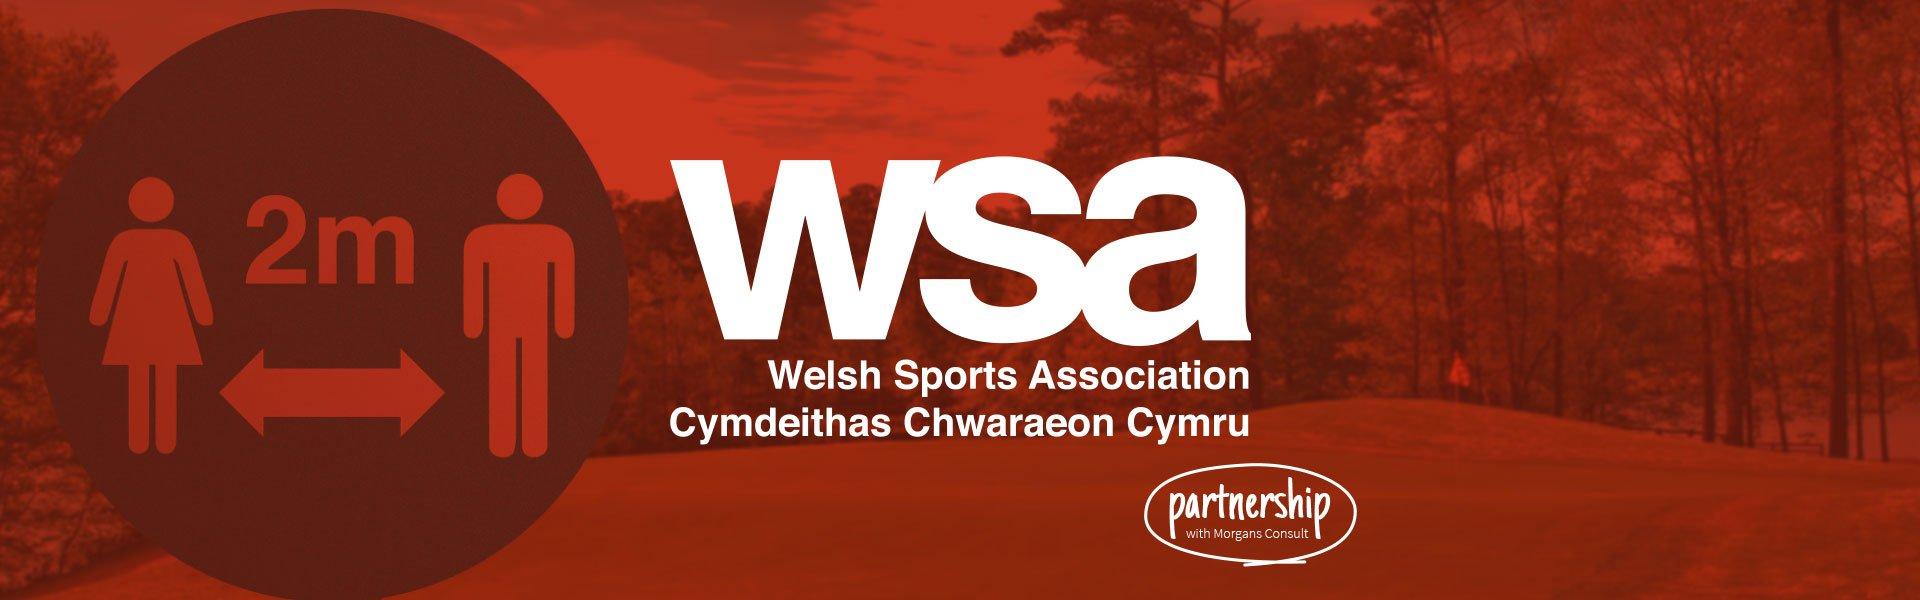 Welsh Sports Association partnership hero